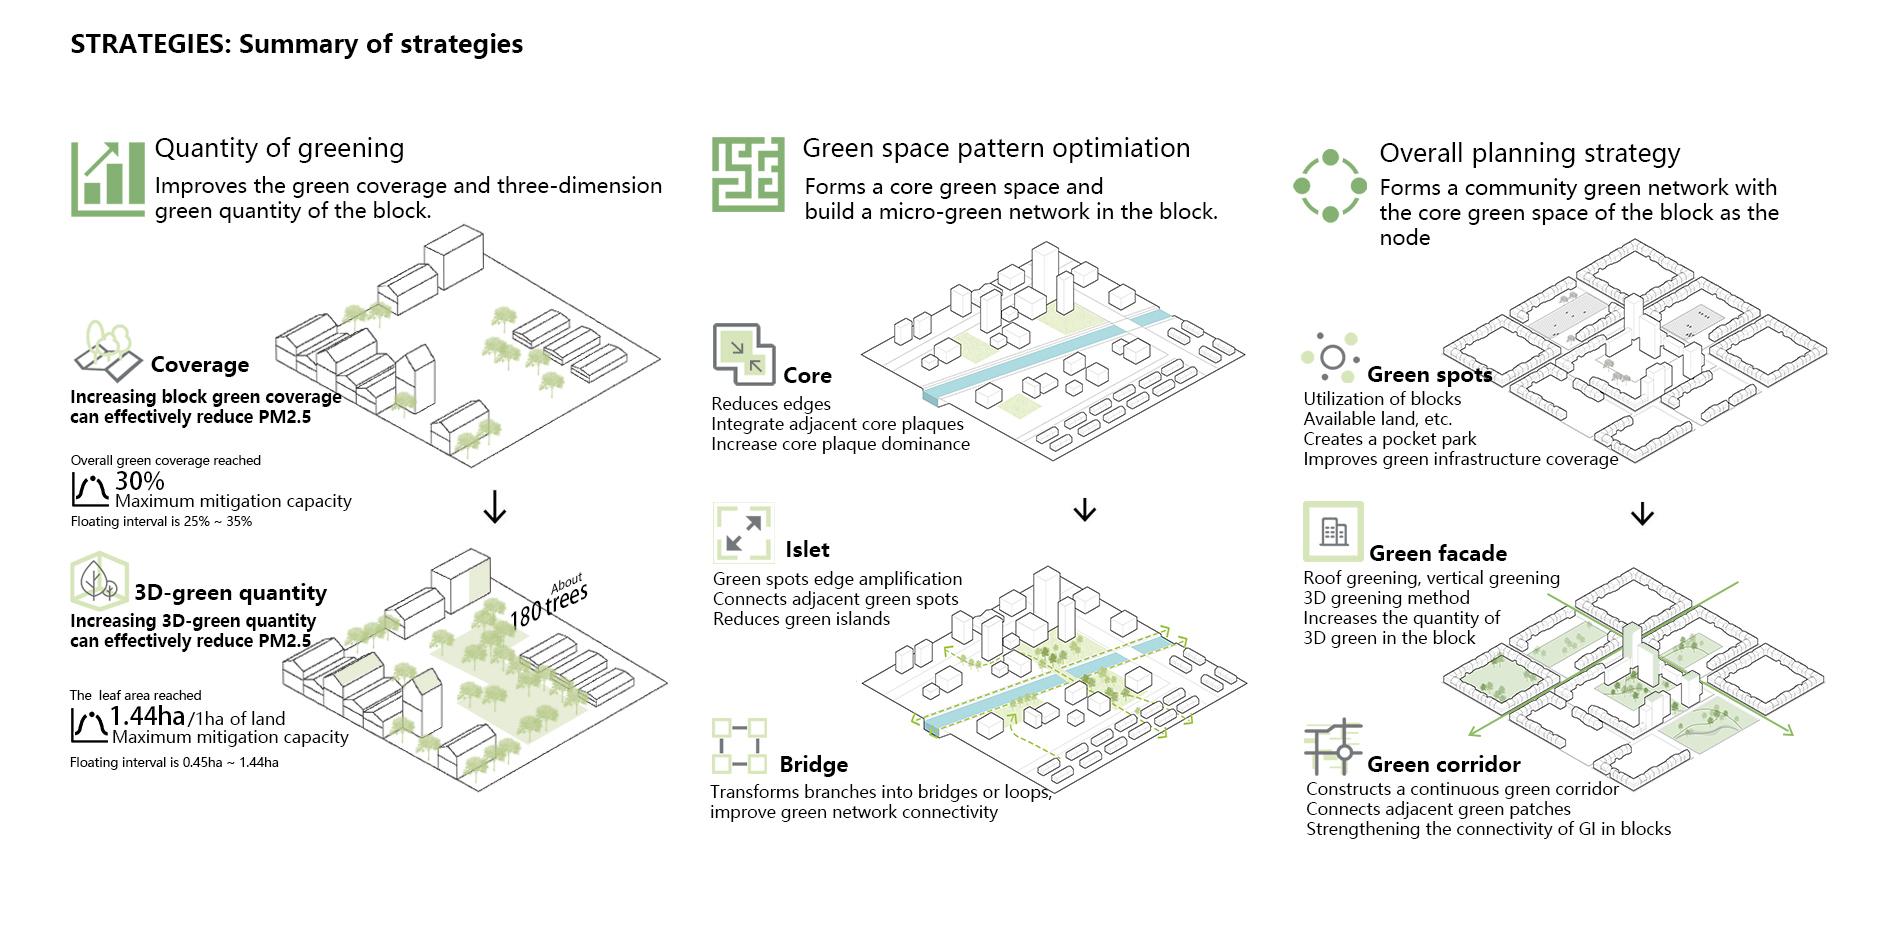 Strategies: Summary of design strategies